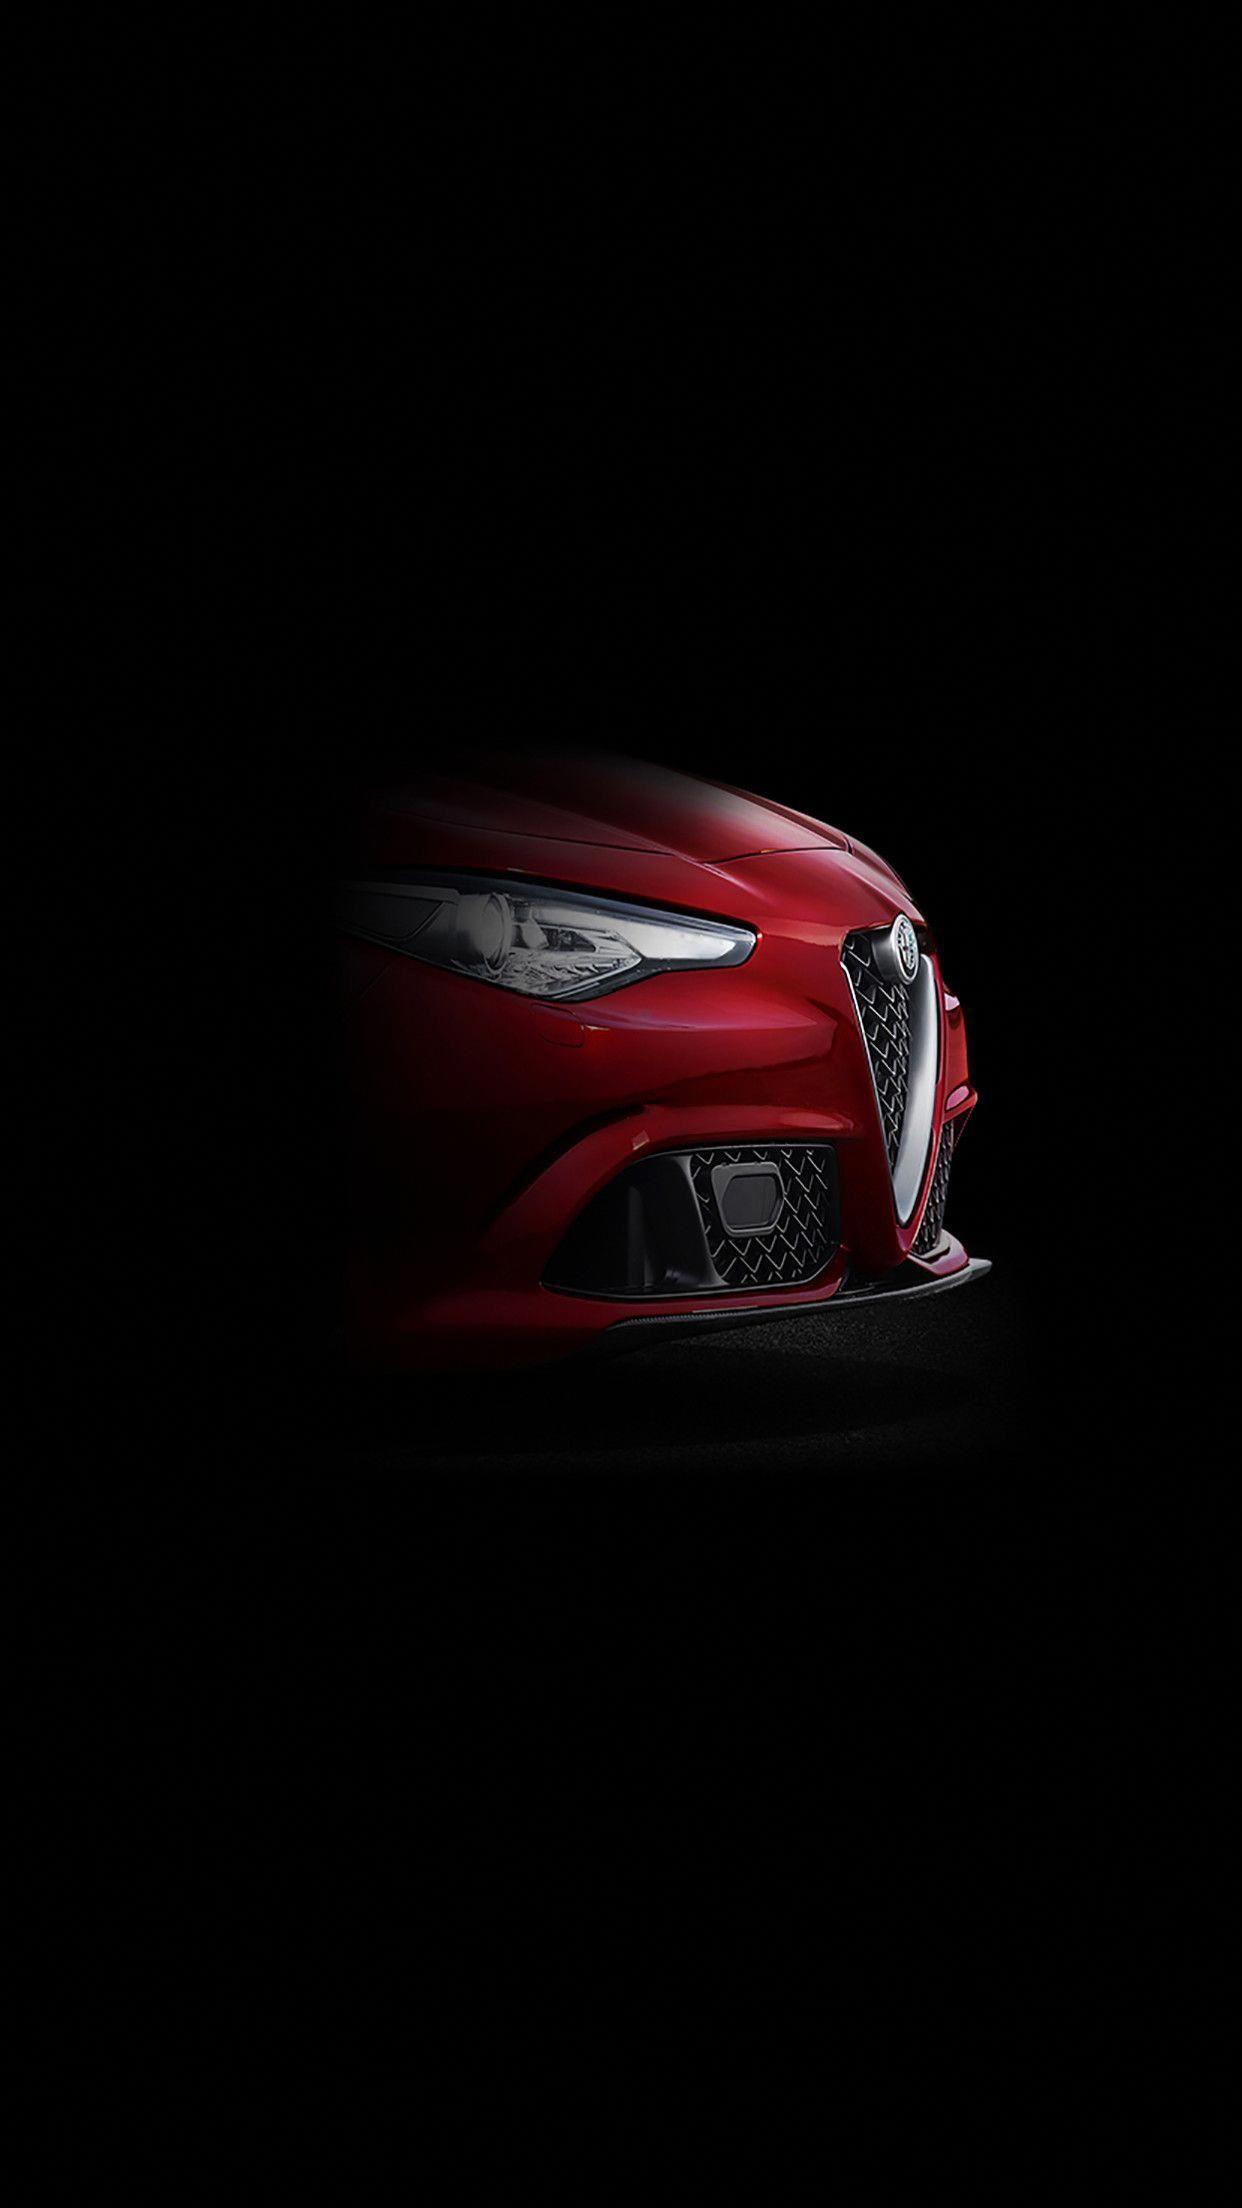 Alfa Romeo Giulia Tecnologia 3wallpapers Iphone P Arallax